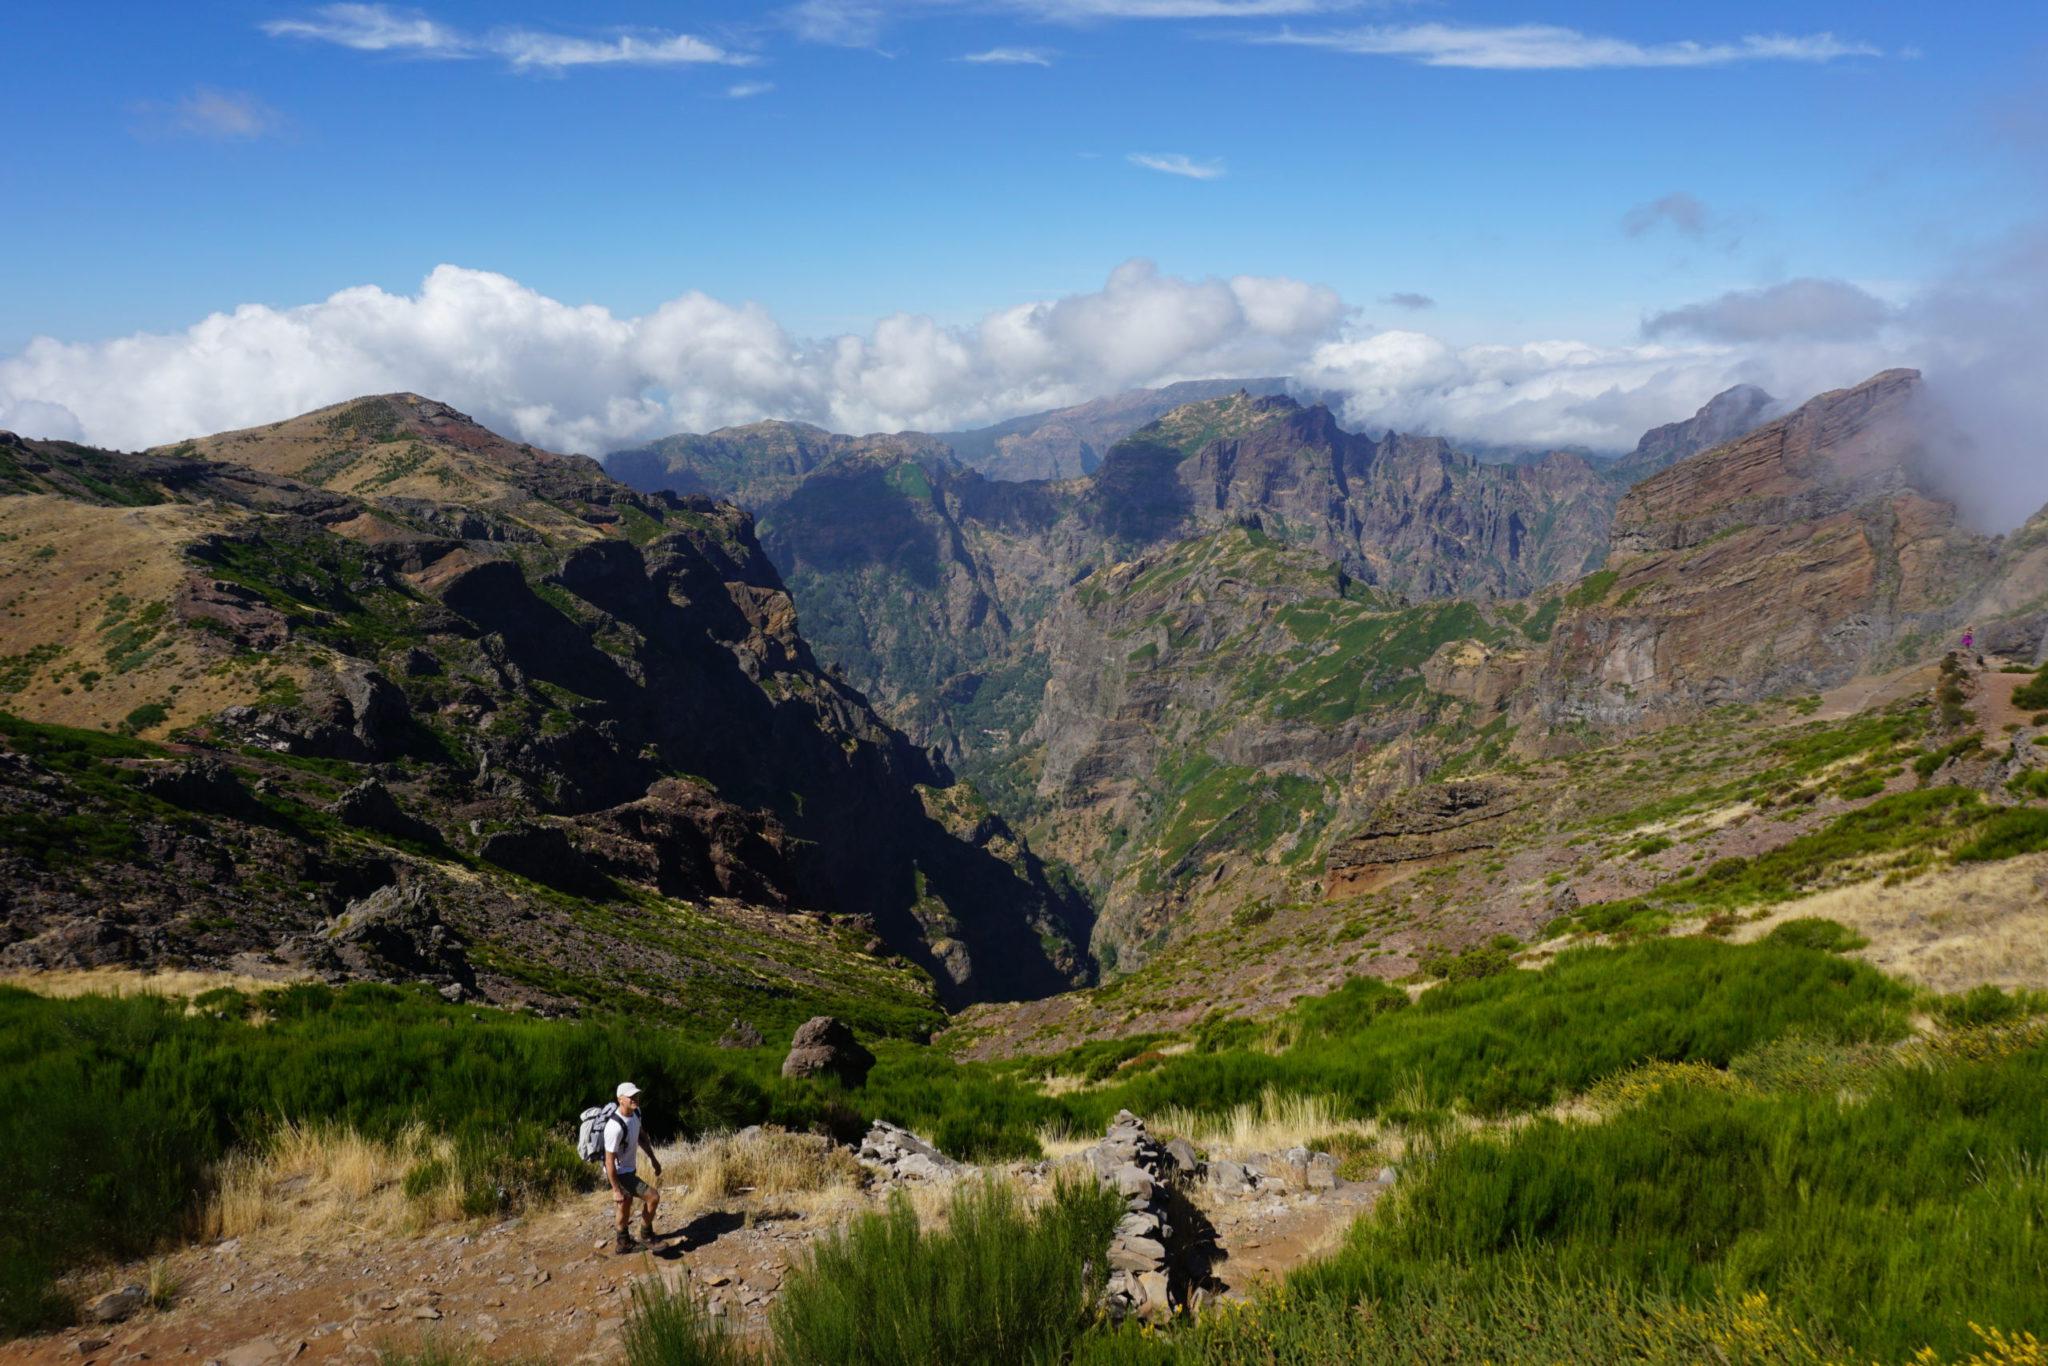 Madeira Island walking holiday: Hike Pico Ruivo and more